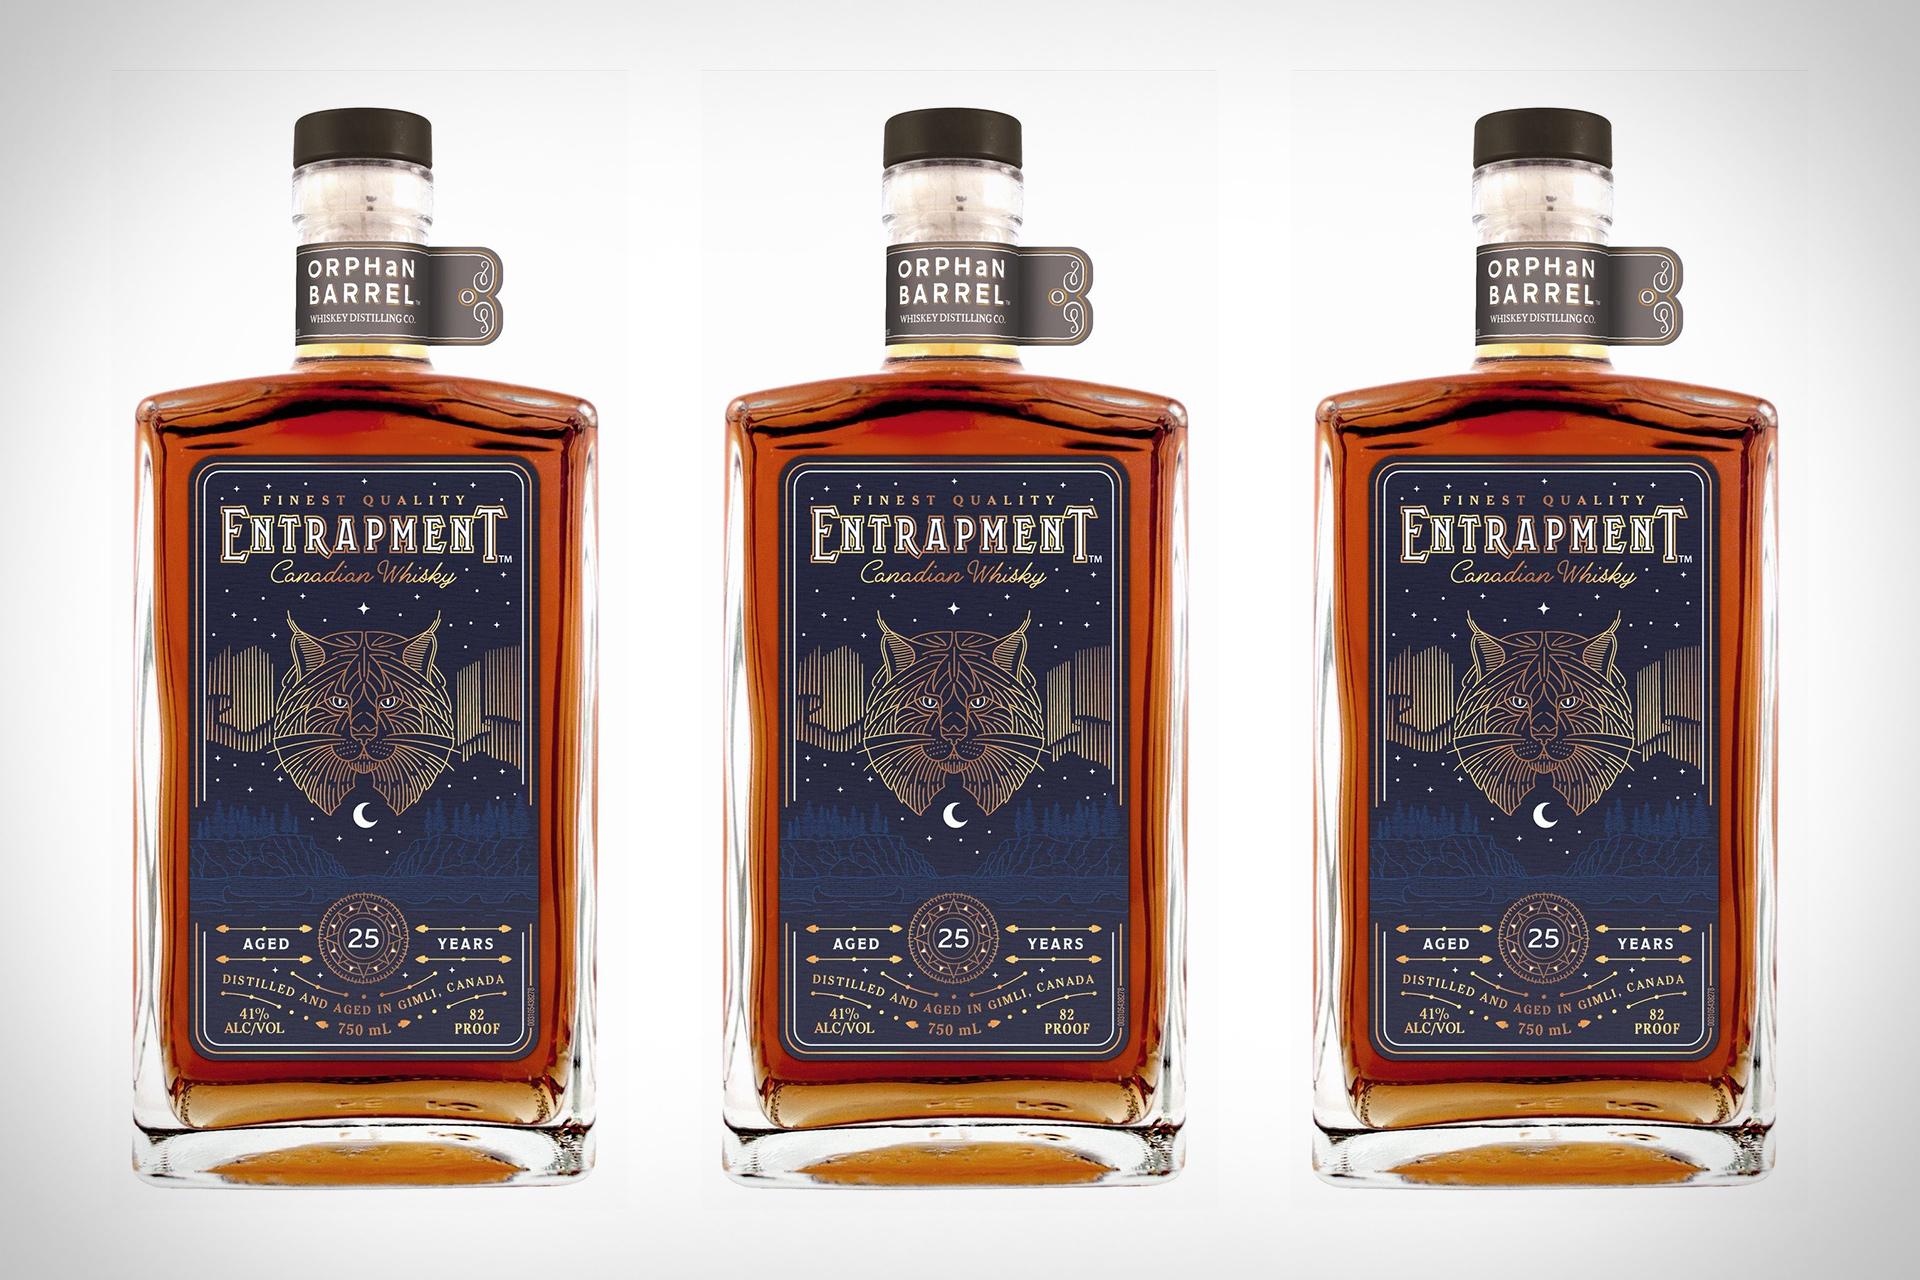 Orphan Barrel Entrapment Canadian Whisky